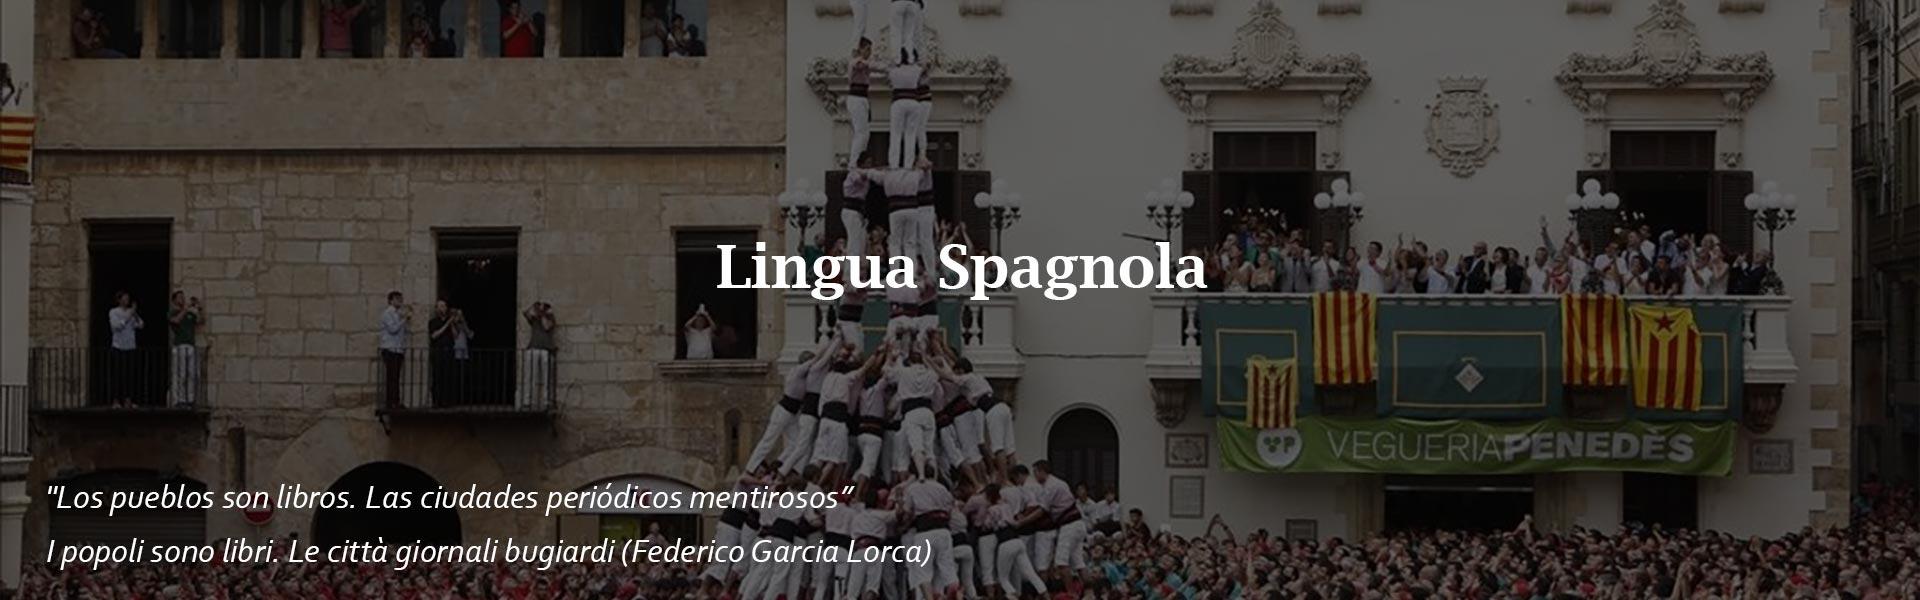 lingua-Spagnola-Alif